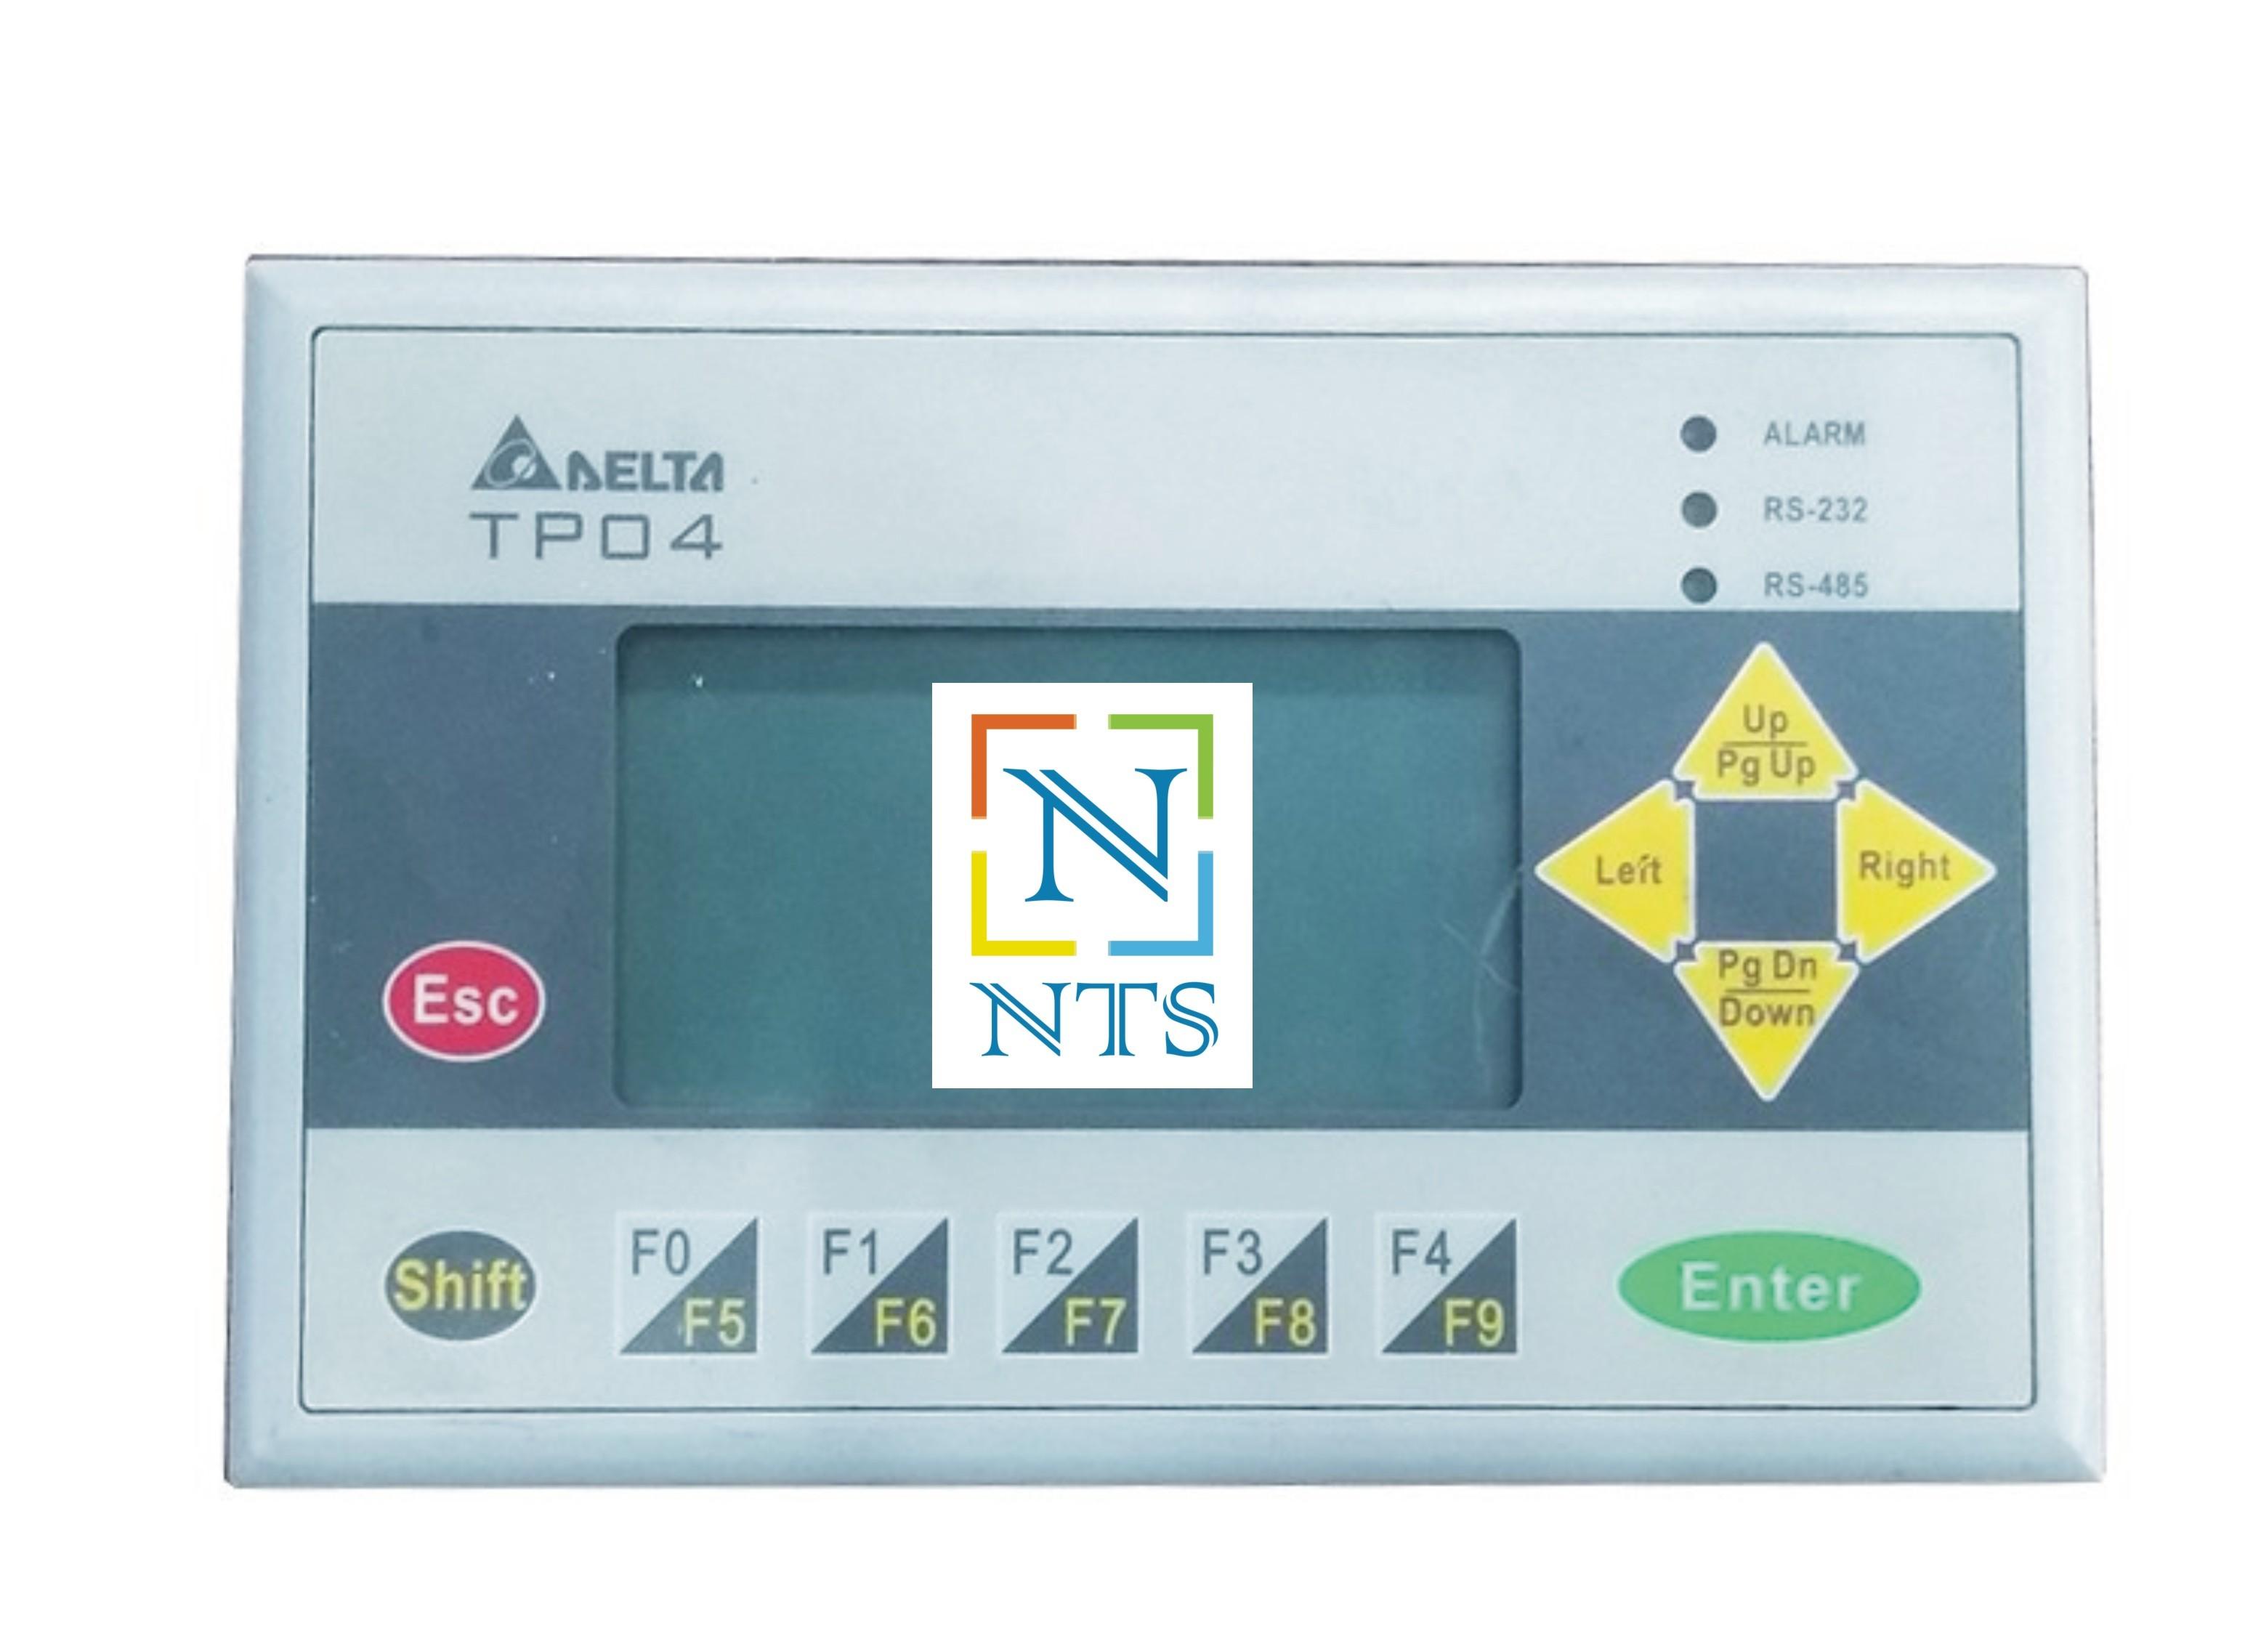 Delta TP04G-AS2 HMI Operator Panel